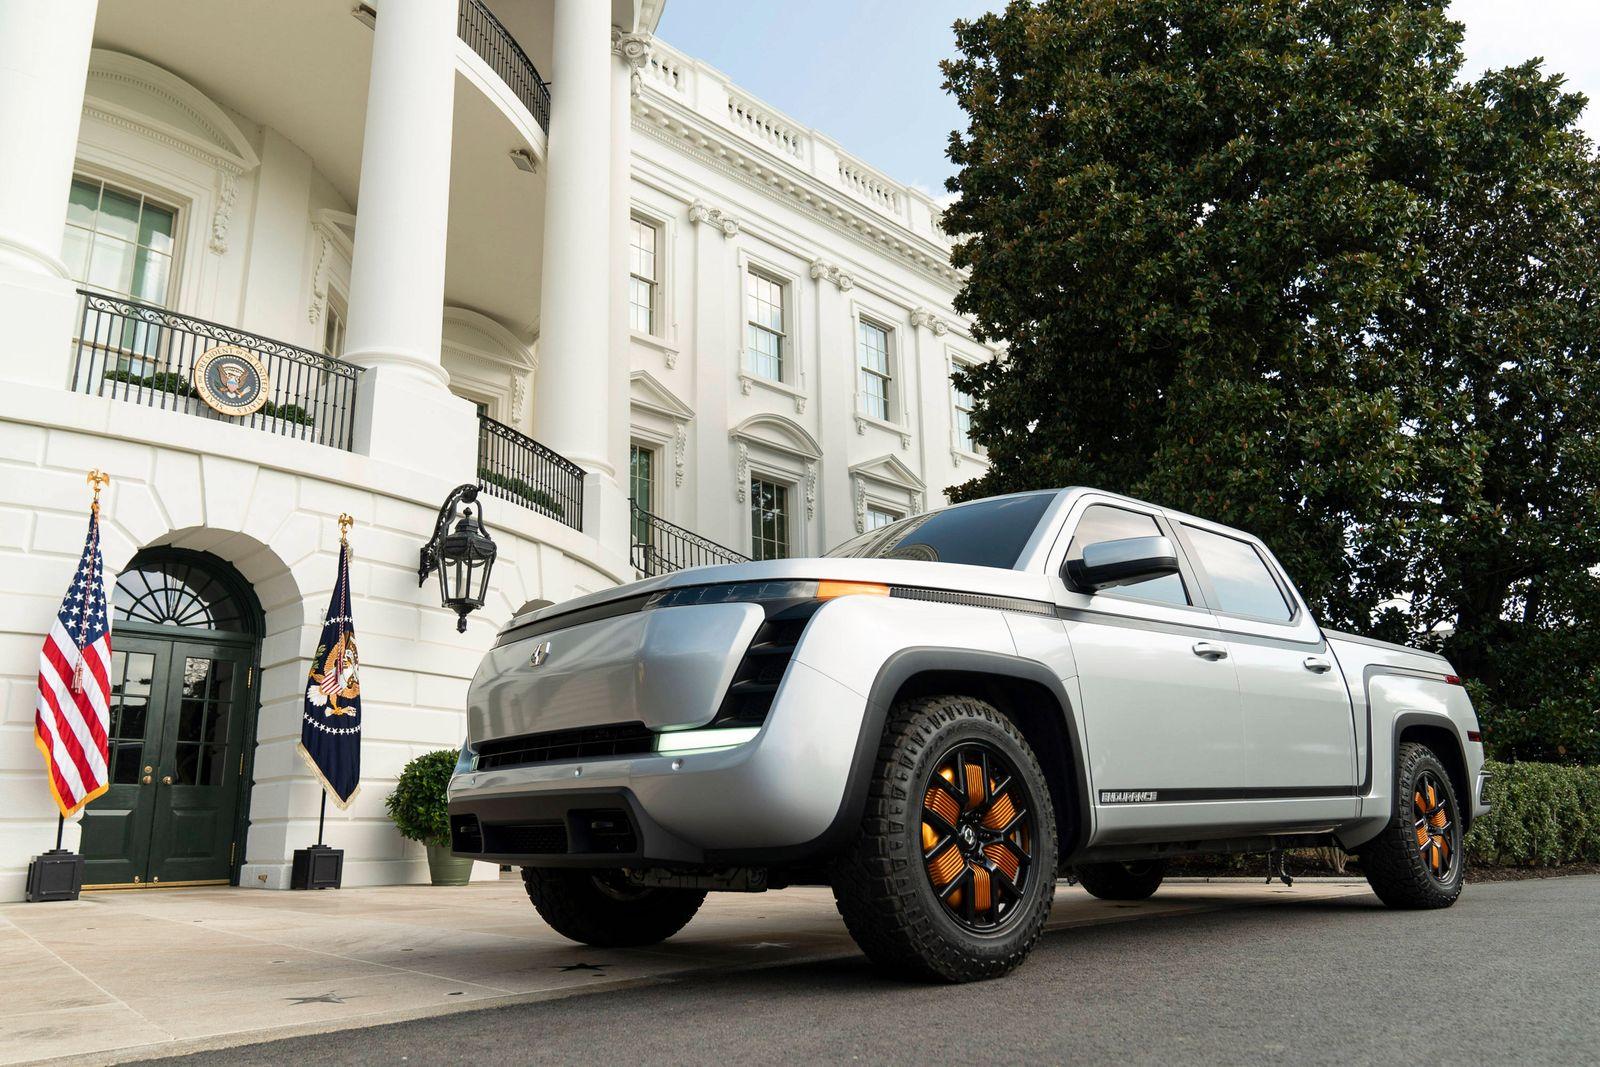 September 28, 2020, Washington, WA, United States of America: The Lordstown 2021 Endurance electric pickup truck display